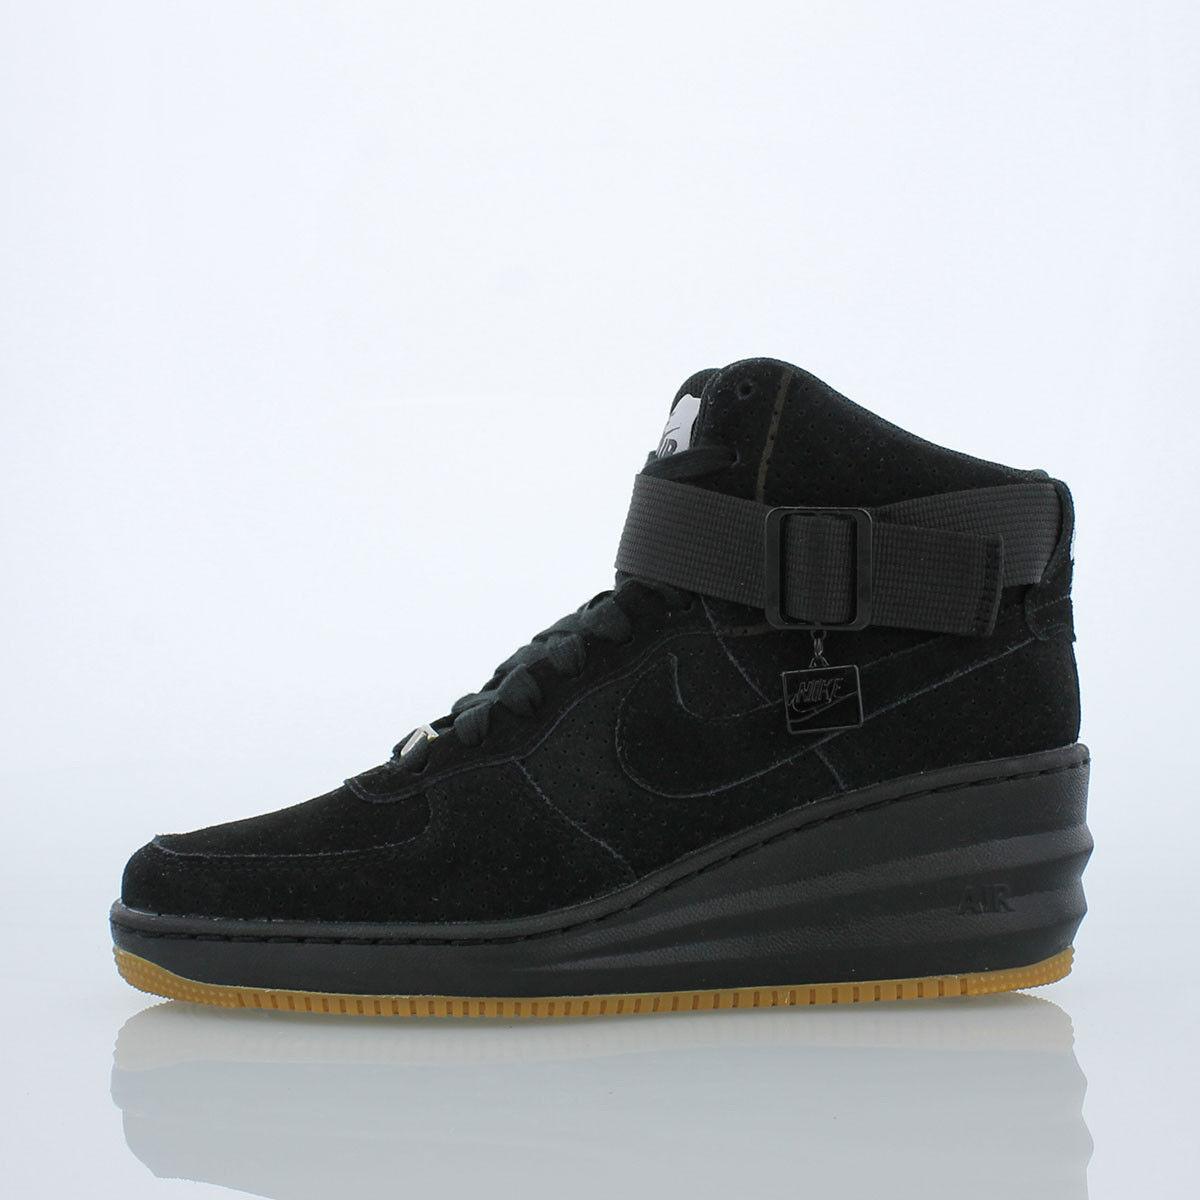 Nike Women's Lunar Air Force 1 Sky Hi BLACK SUEDE GUM SOLE DUNK 654848-006 8.5